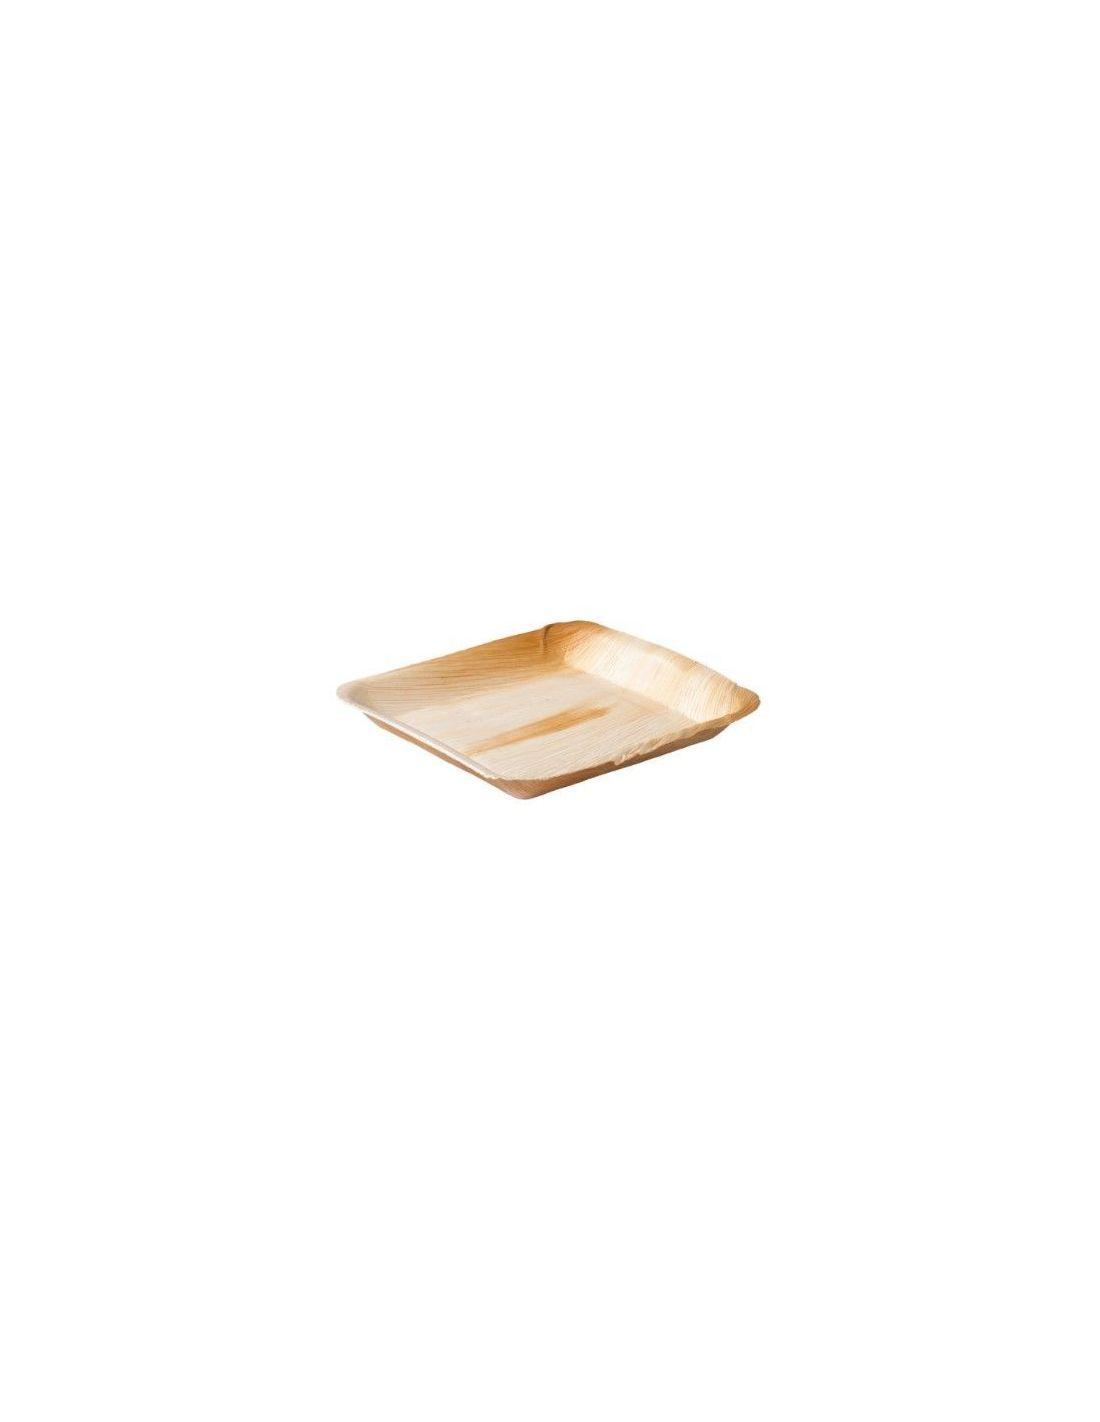 Palmilehest kandiline taldrik 24 x 24 cm